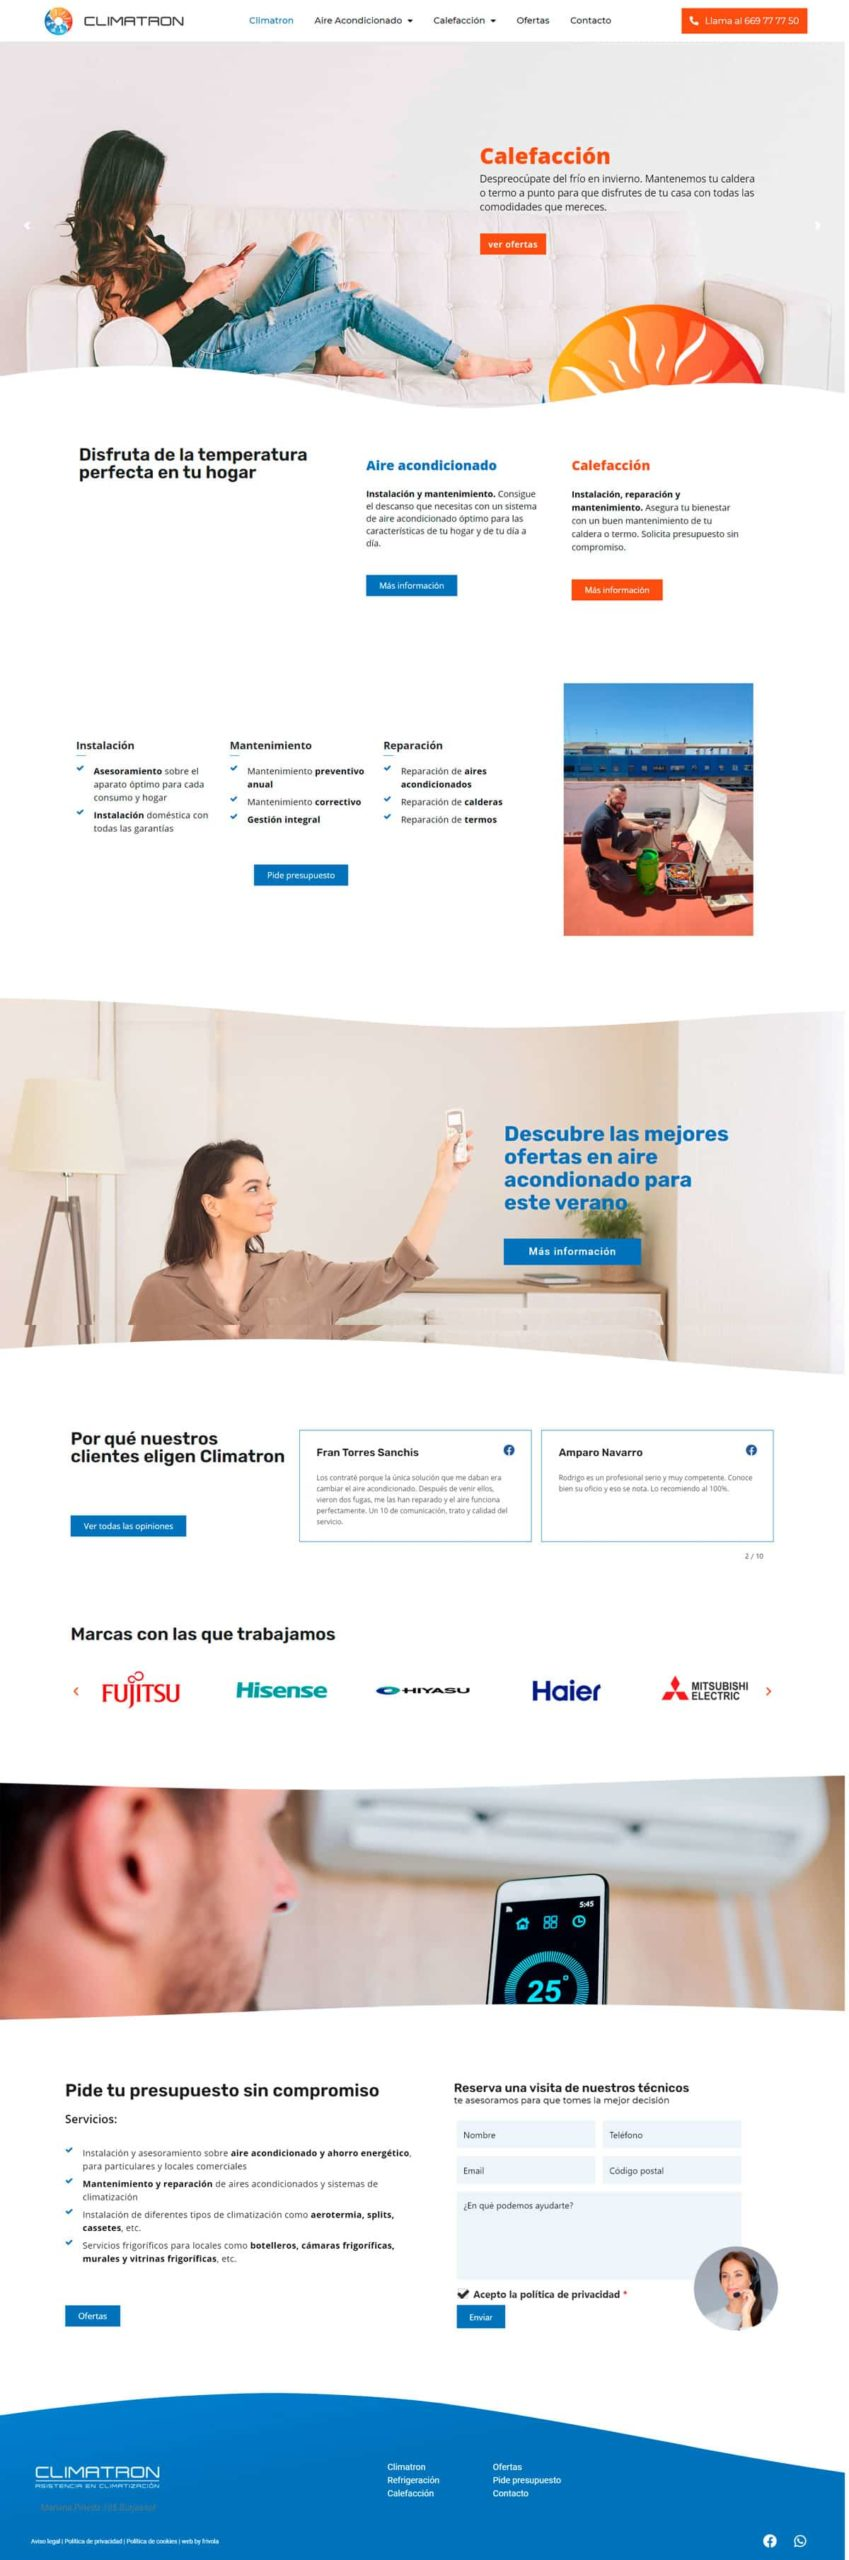 diseño web • Climatron